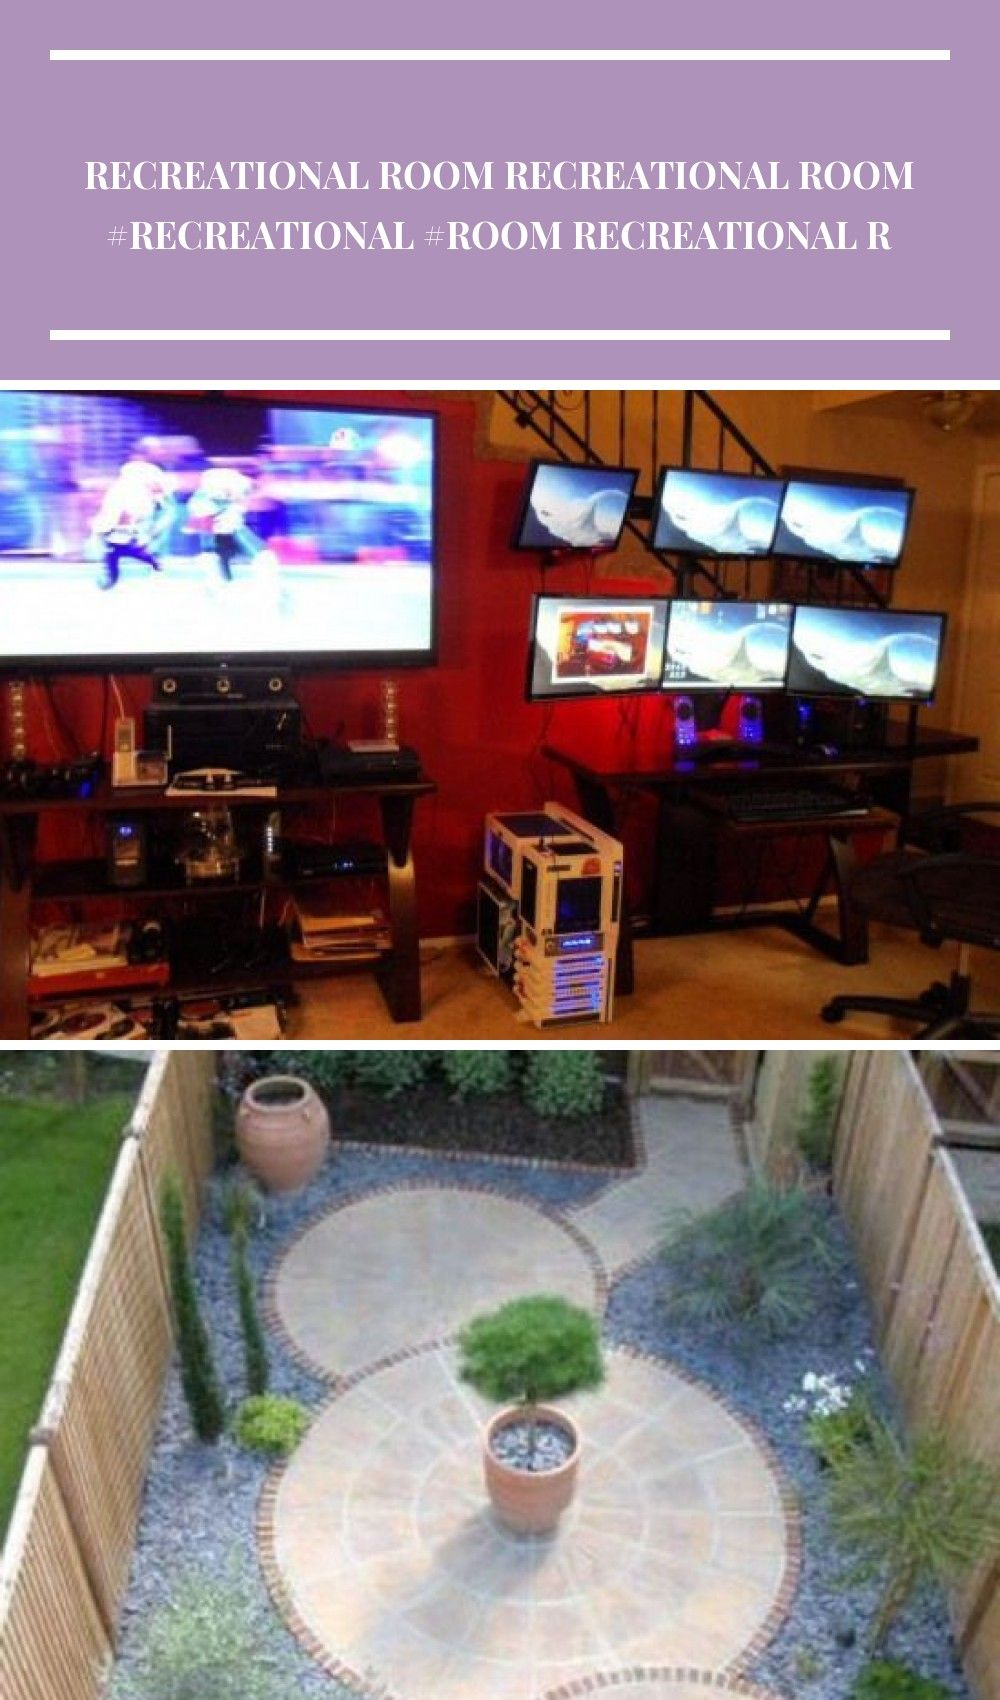 Photo of Rob Schatz's #Gaming Setup #Recreational Room #Recreational Room #Cabinets, #Ca …